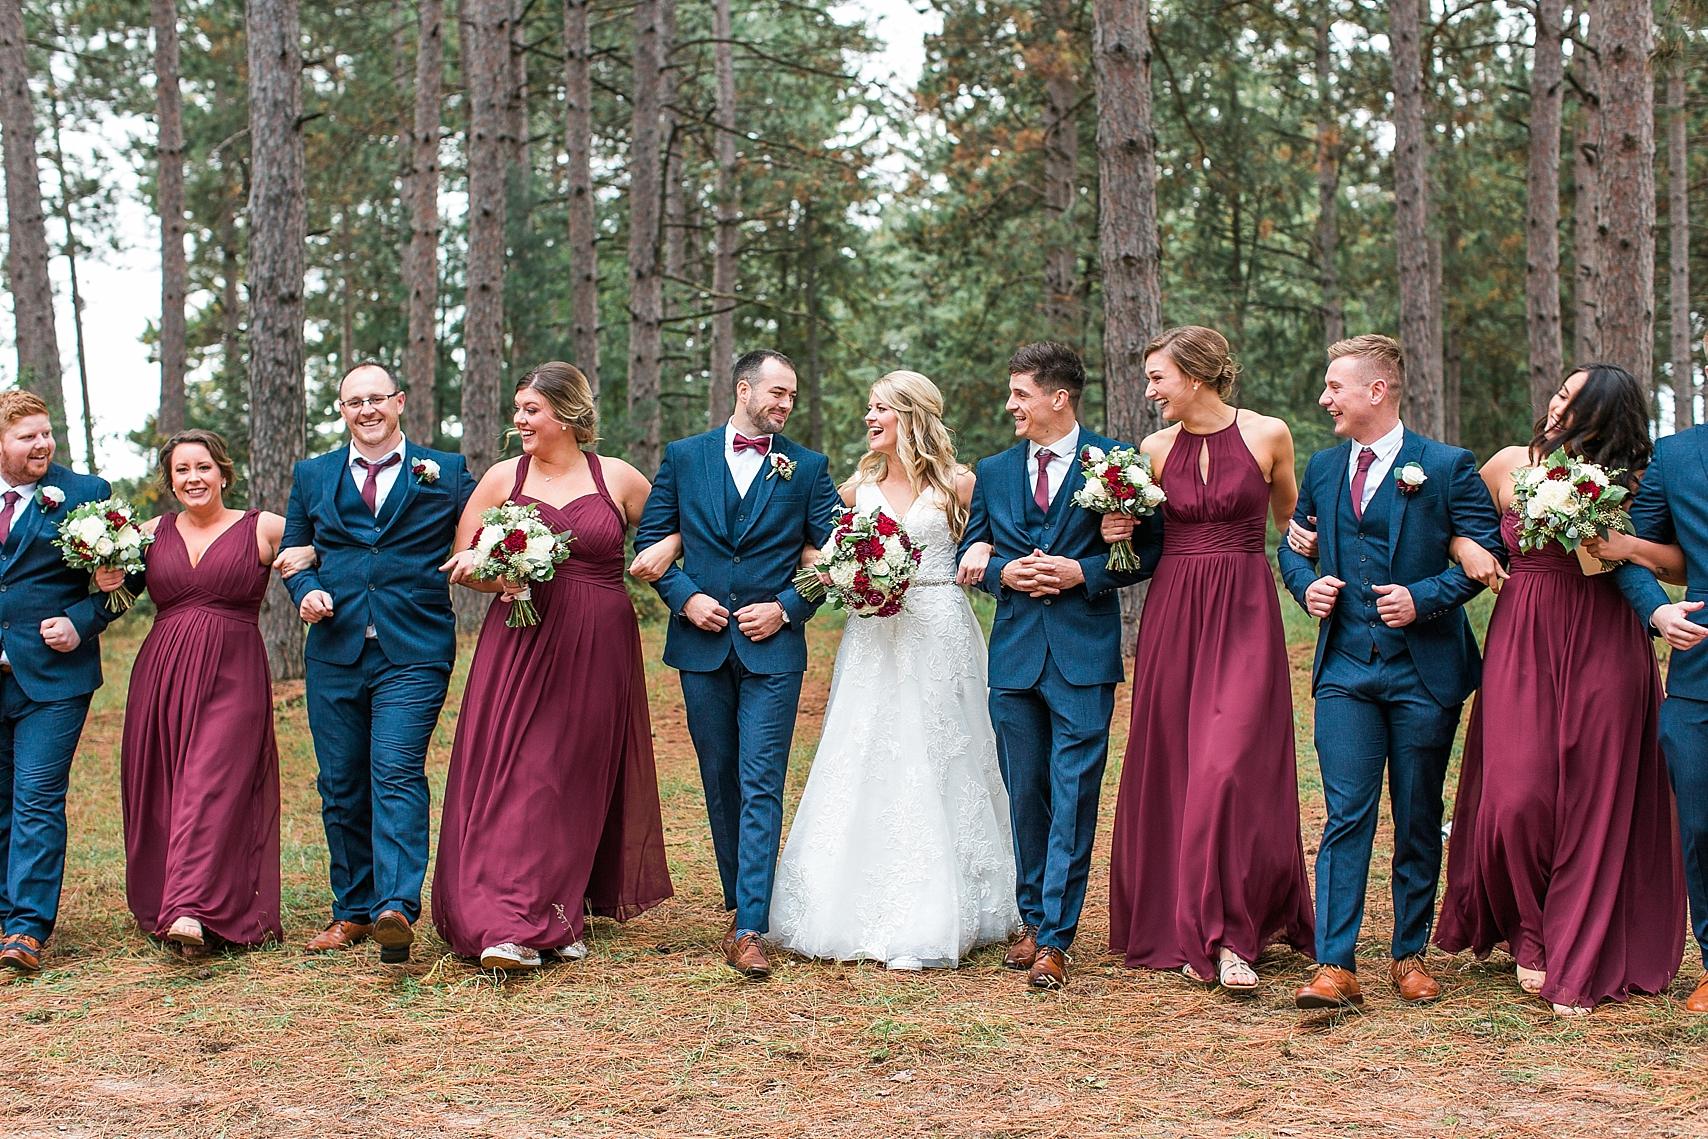 Minnesota Minneapolis Wedding Photographer Best Of 2018 Weddings Mallory Kiesow Photography_0170.jpg